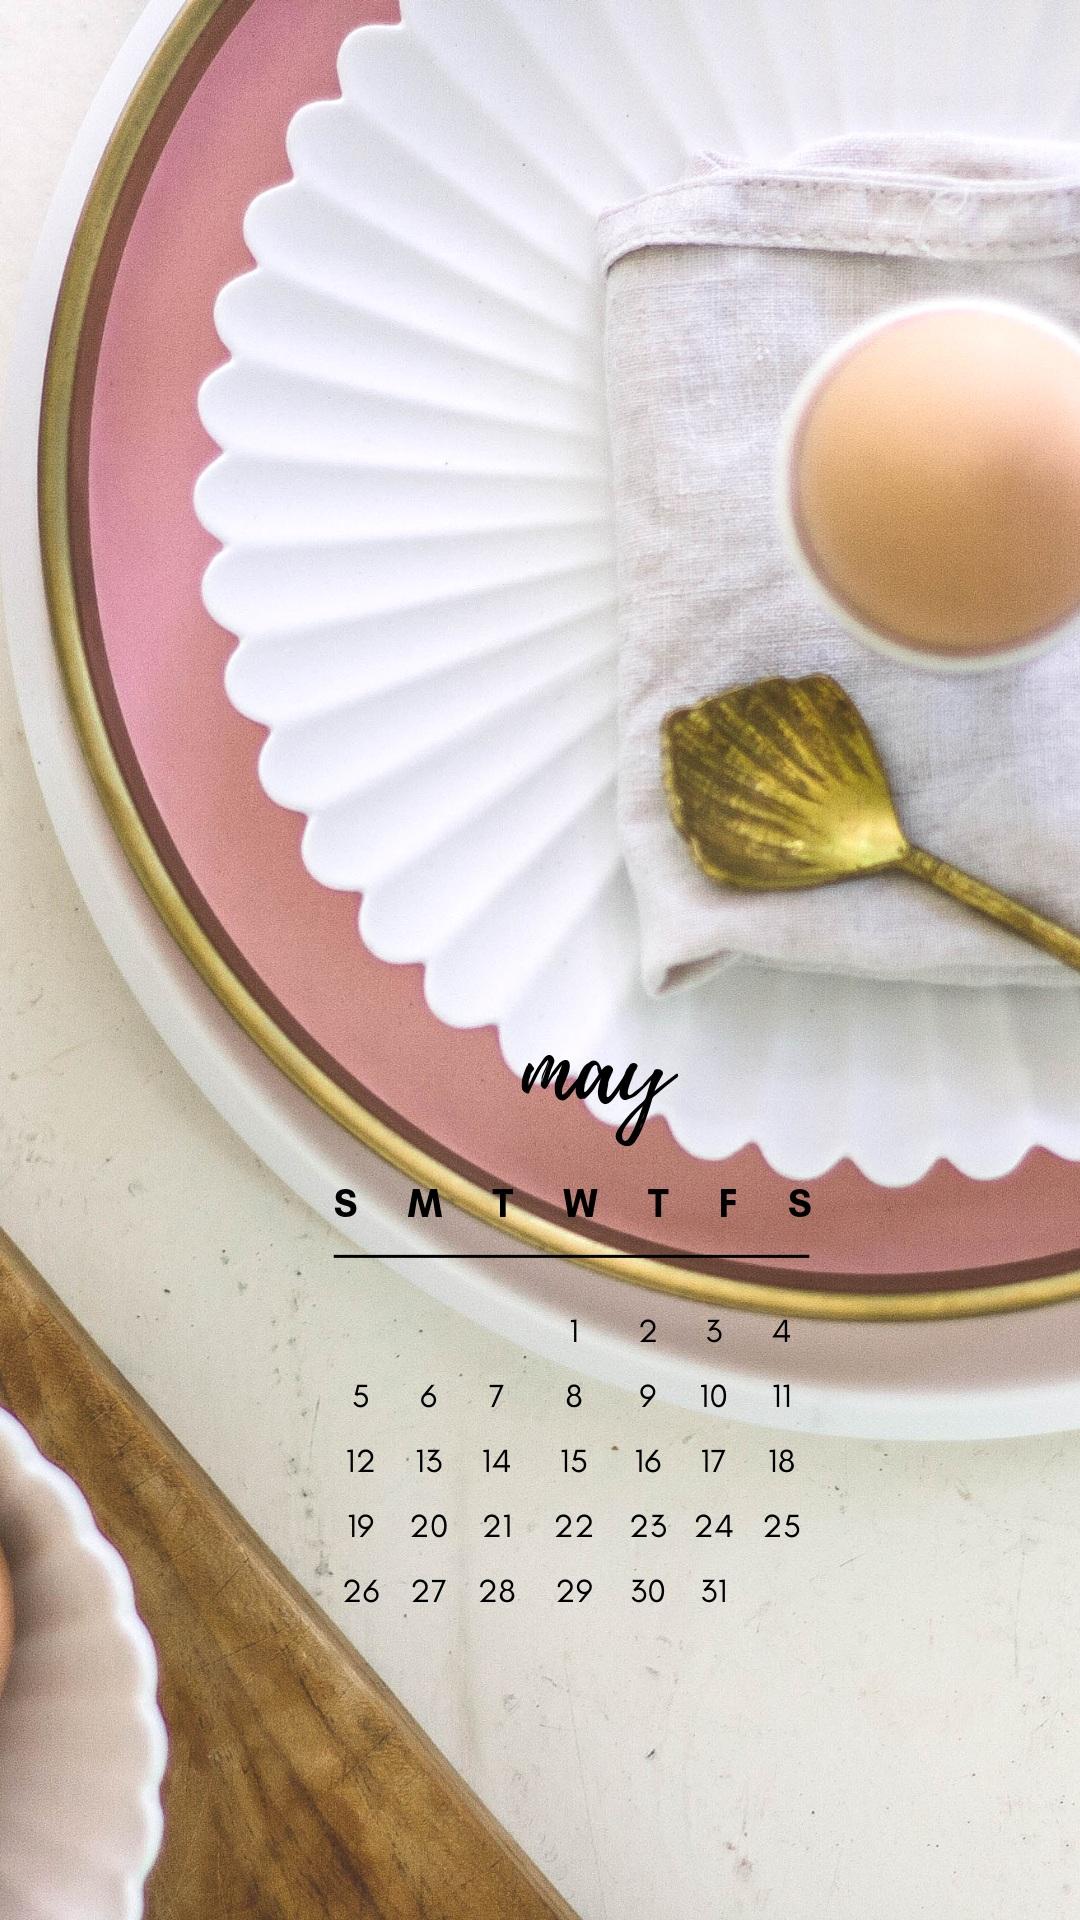 iphone may 2019 calendar.png